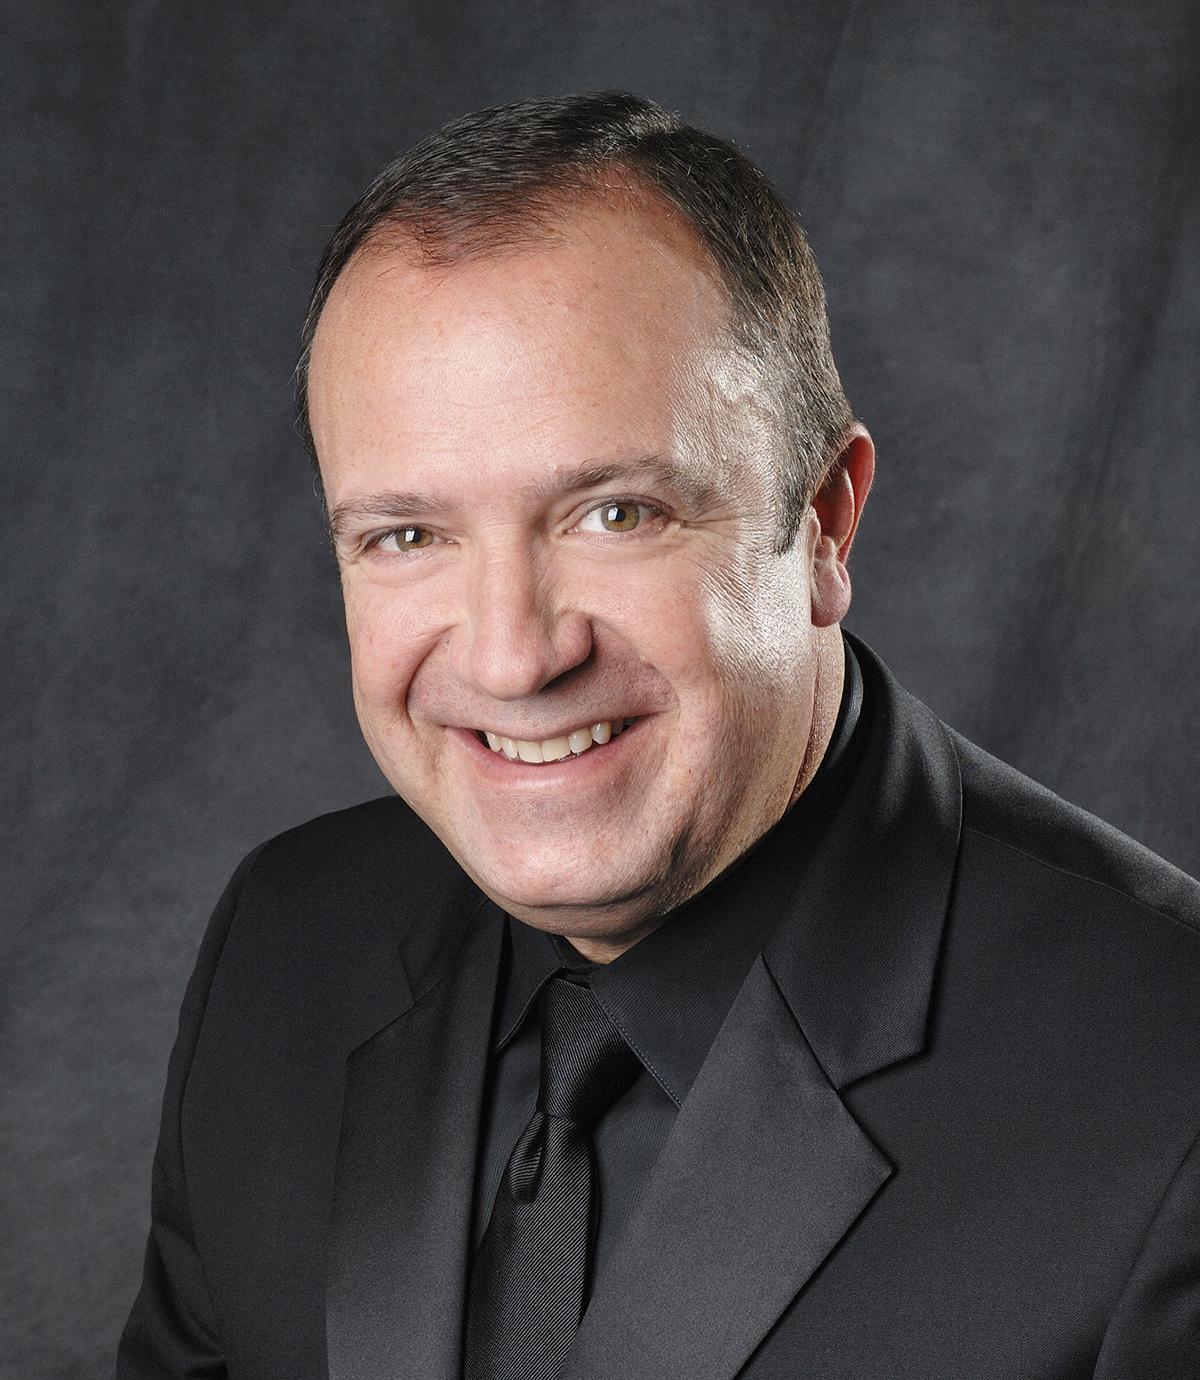 Kevin Sedatole